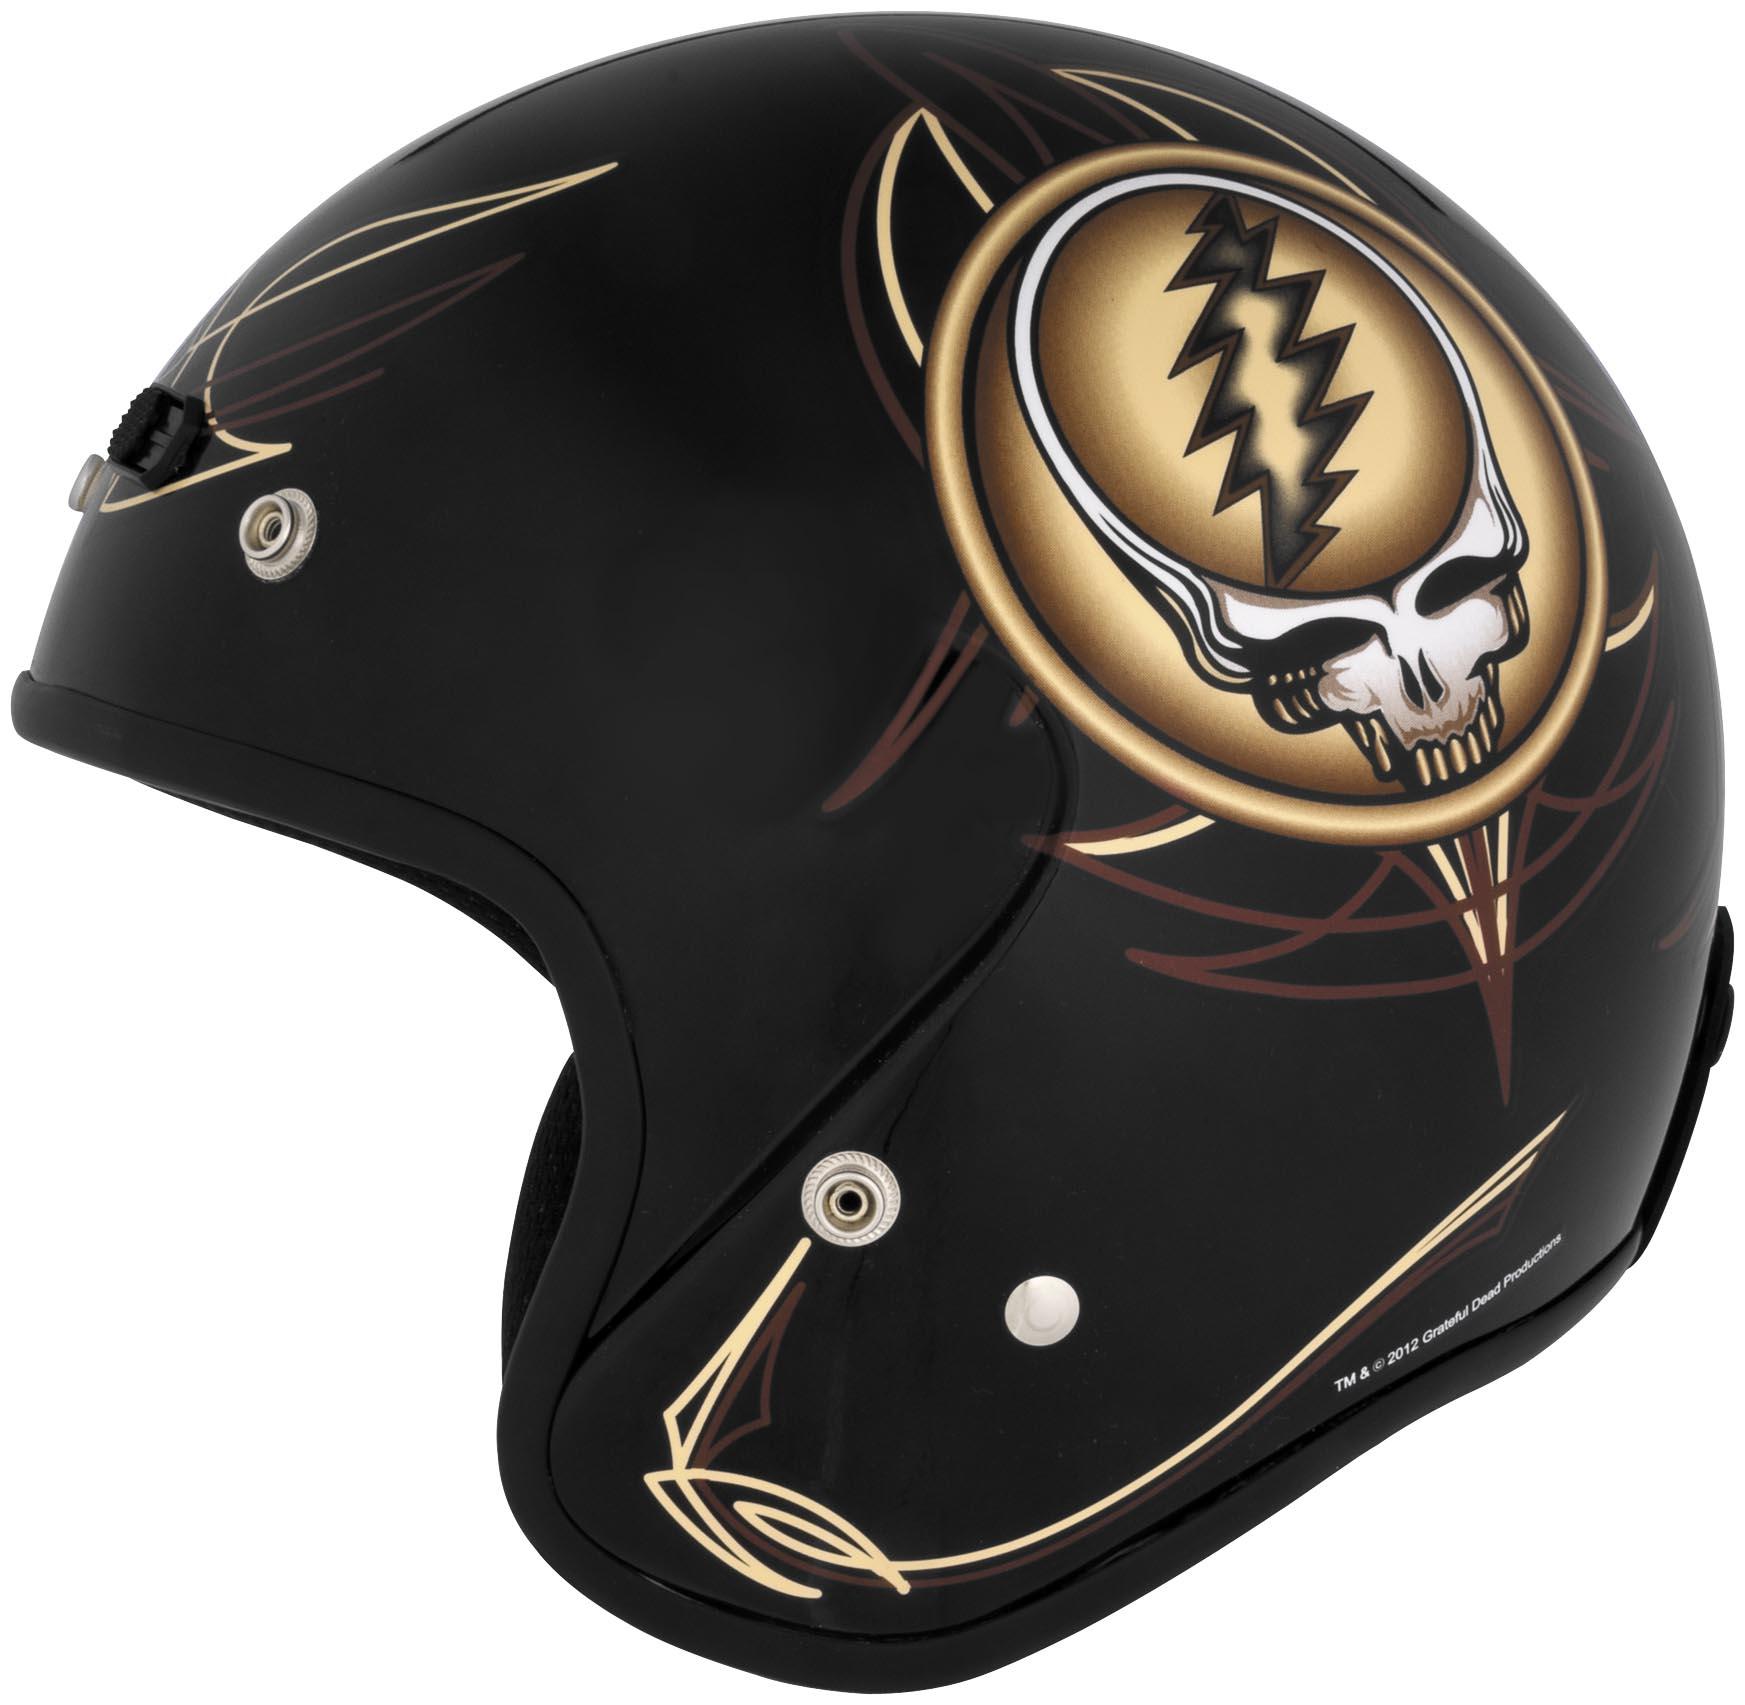 Grateful Dead Open Face Motorcycle Helmet Steal Your